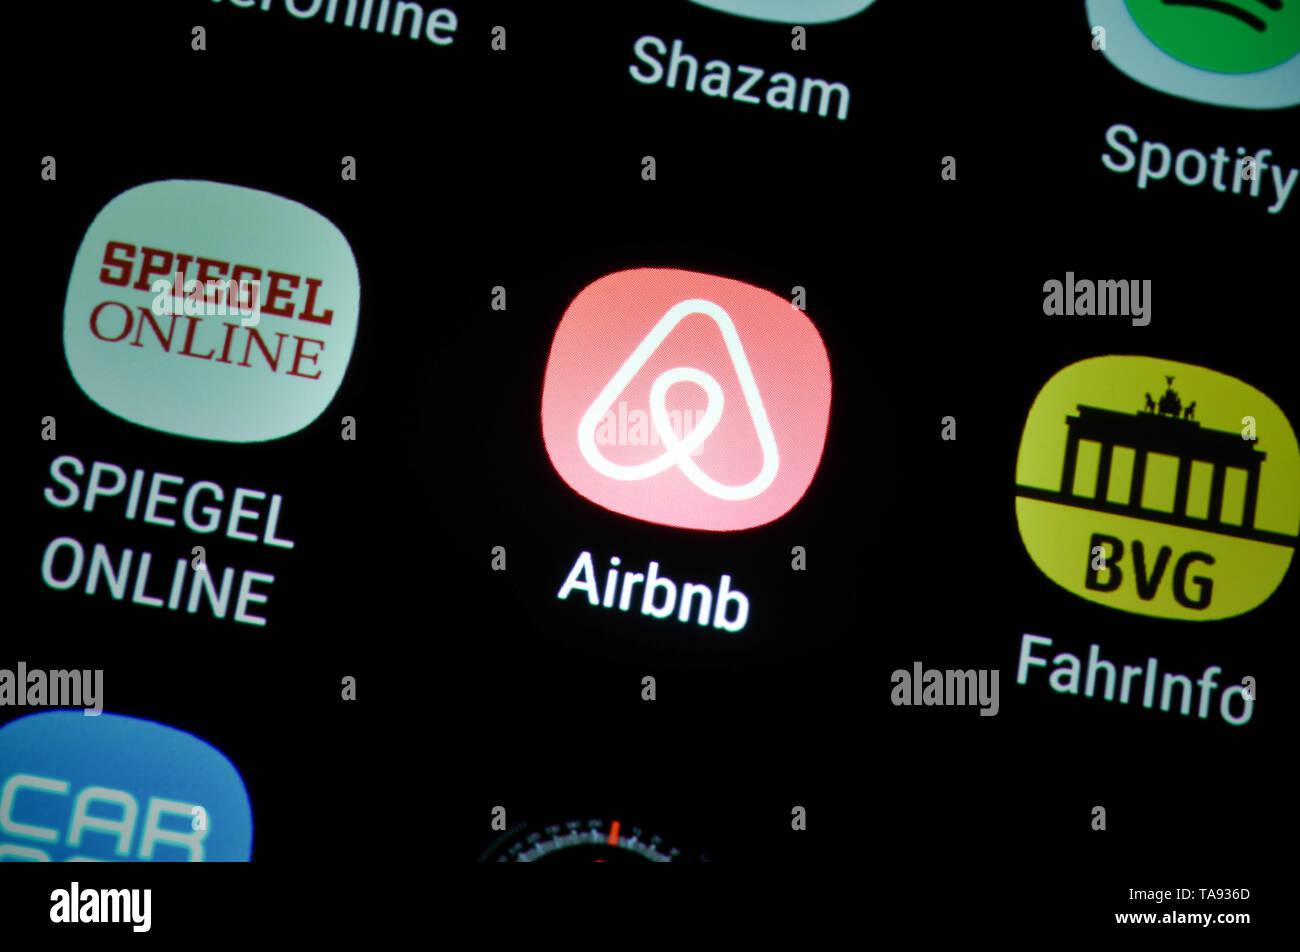 Smartphone, display, ext , Airbnb, Display, App Stock Photo